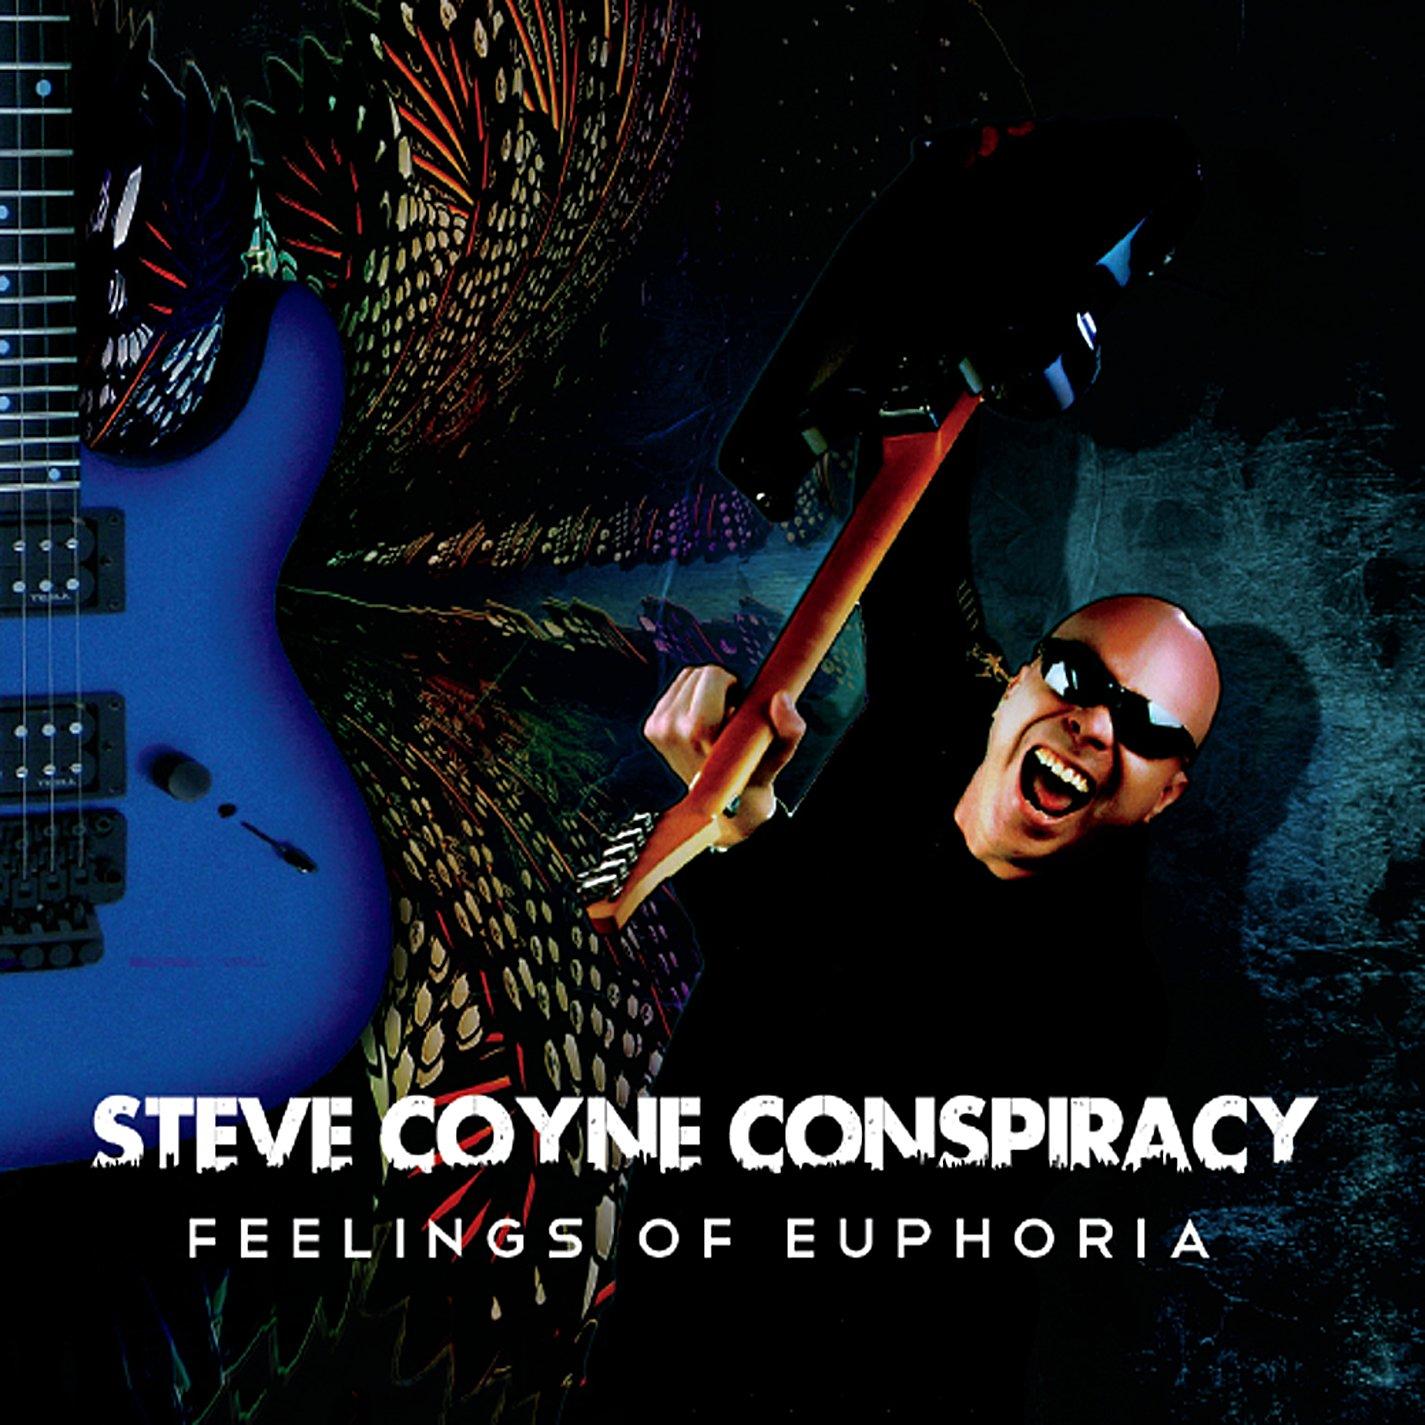 STEVE COYNE CONSPIRACY Feelings Of Euphoria